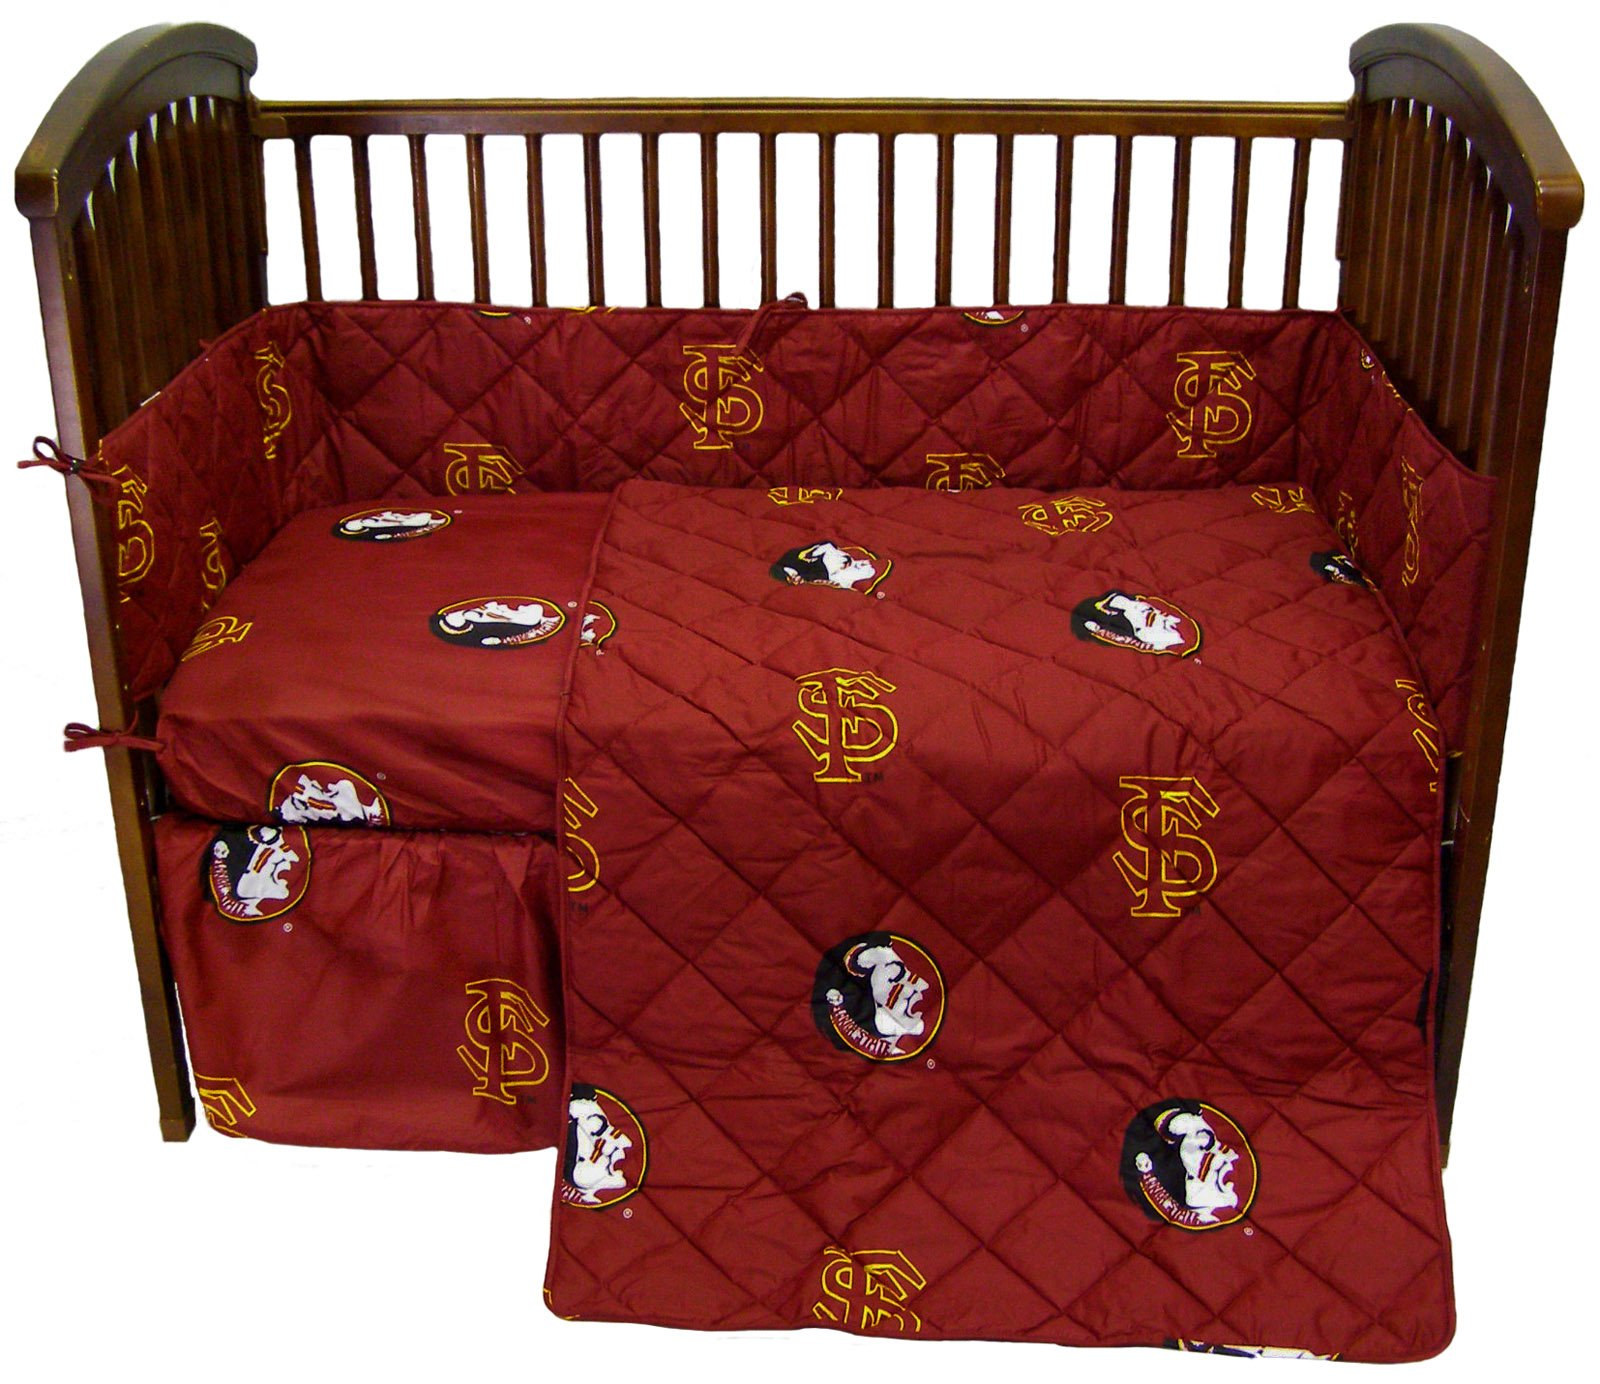 College Covers Florida State Seminoles 5 piece Baby Crib Set